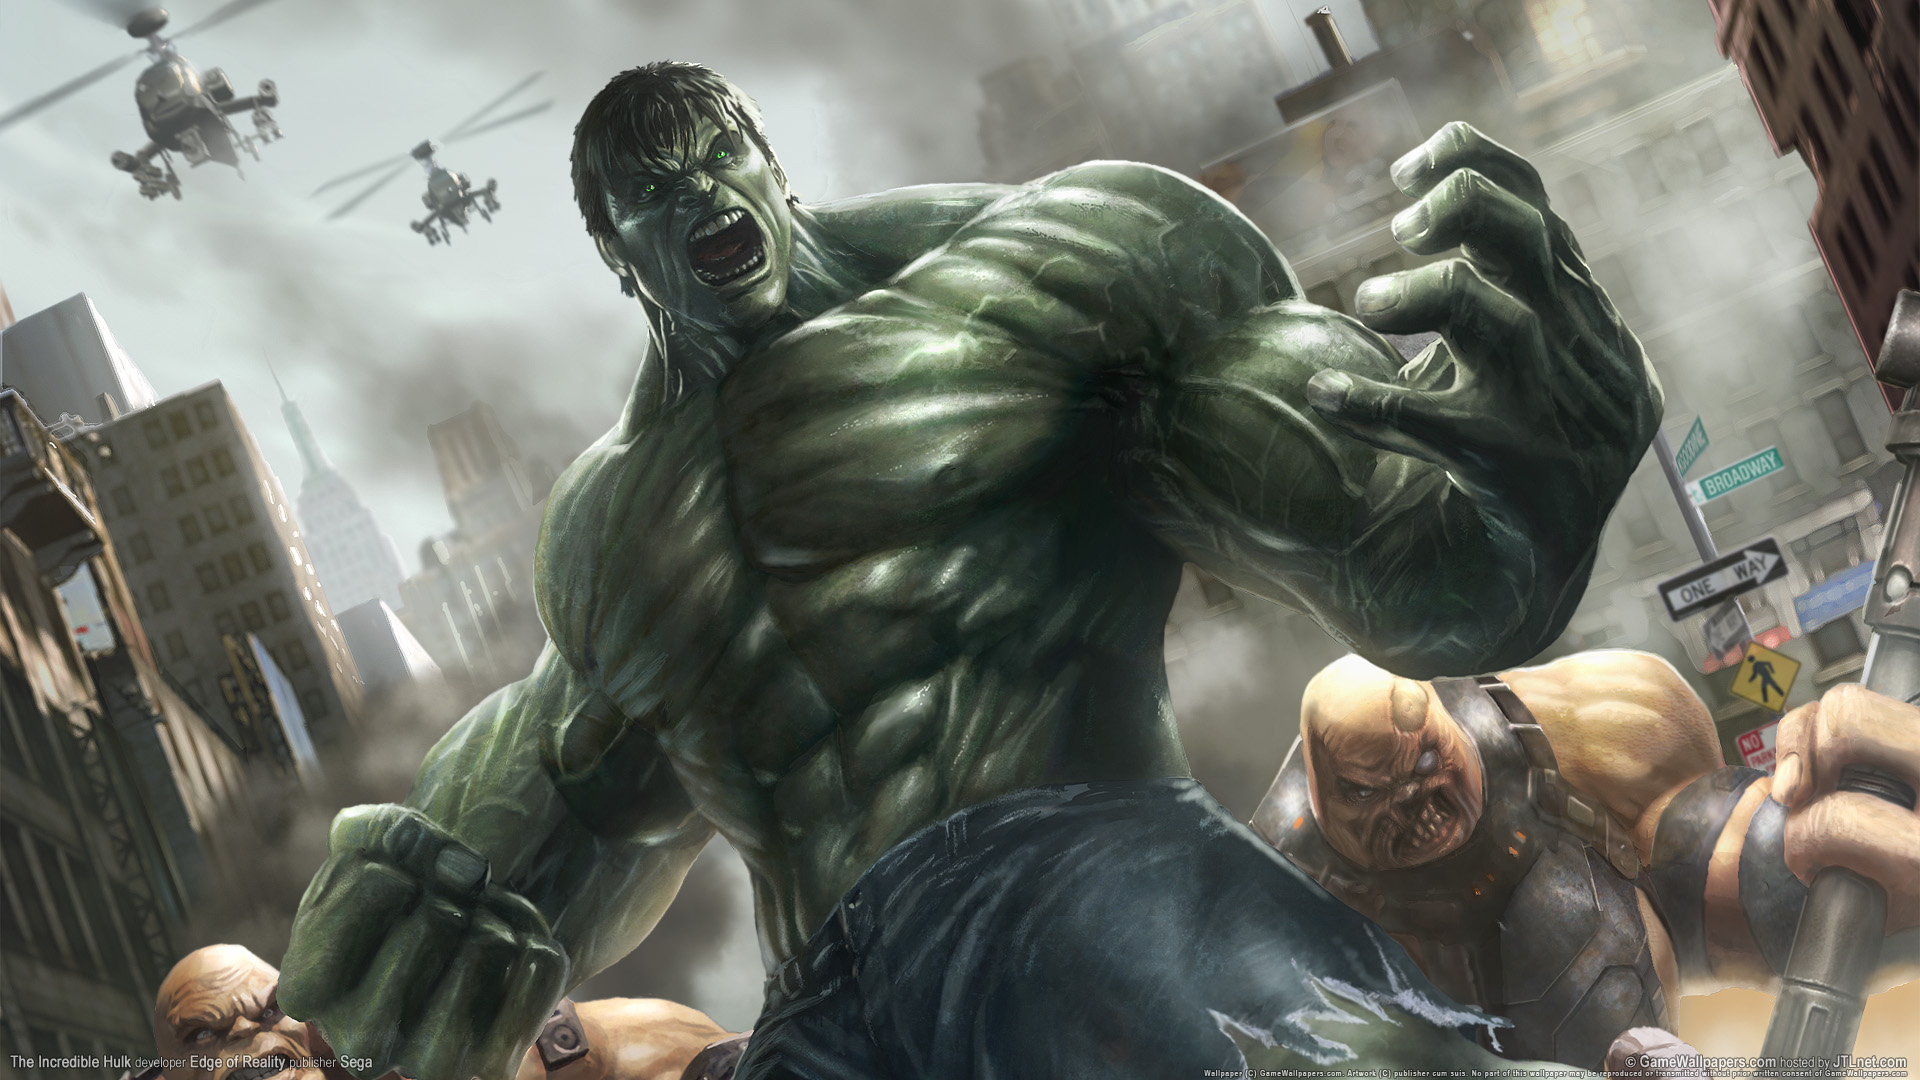 Hulk HD Wallpapers for desktop download 1920x1080